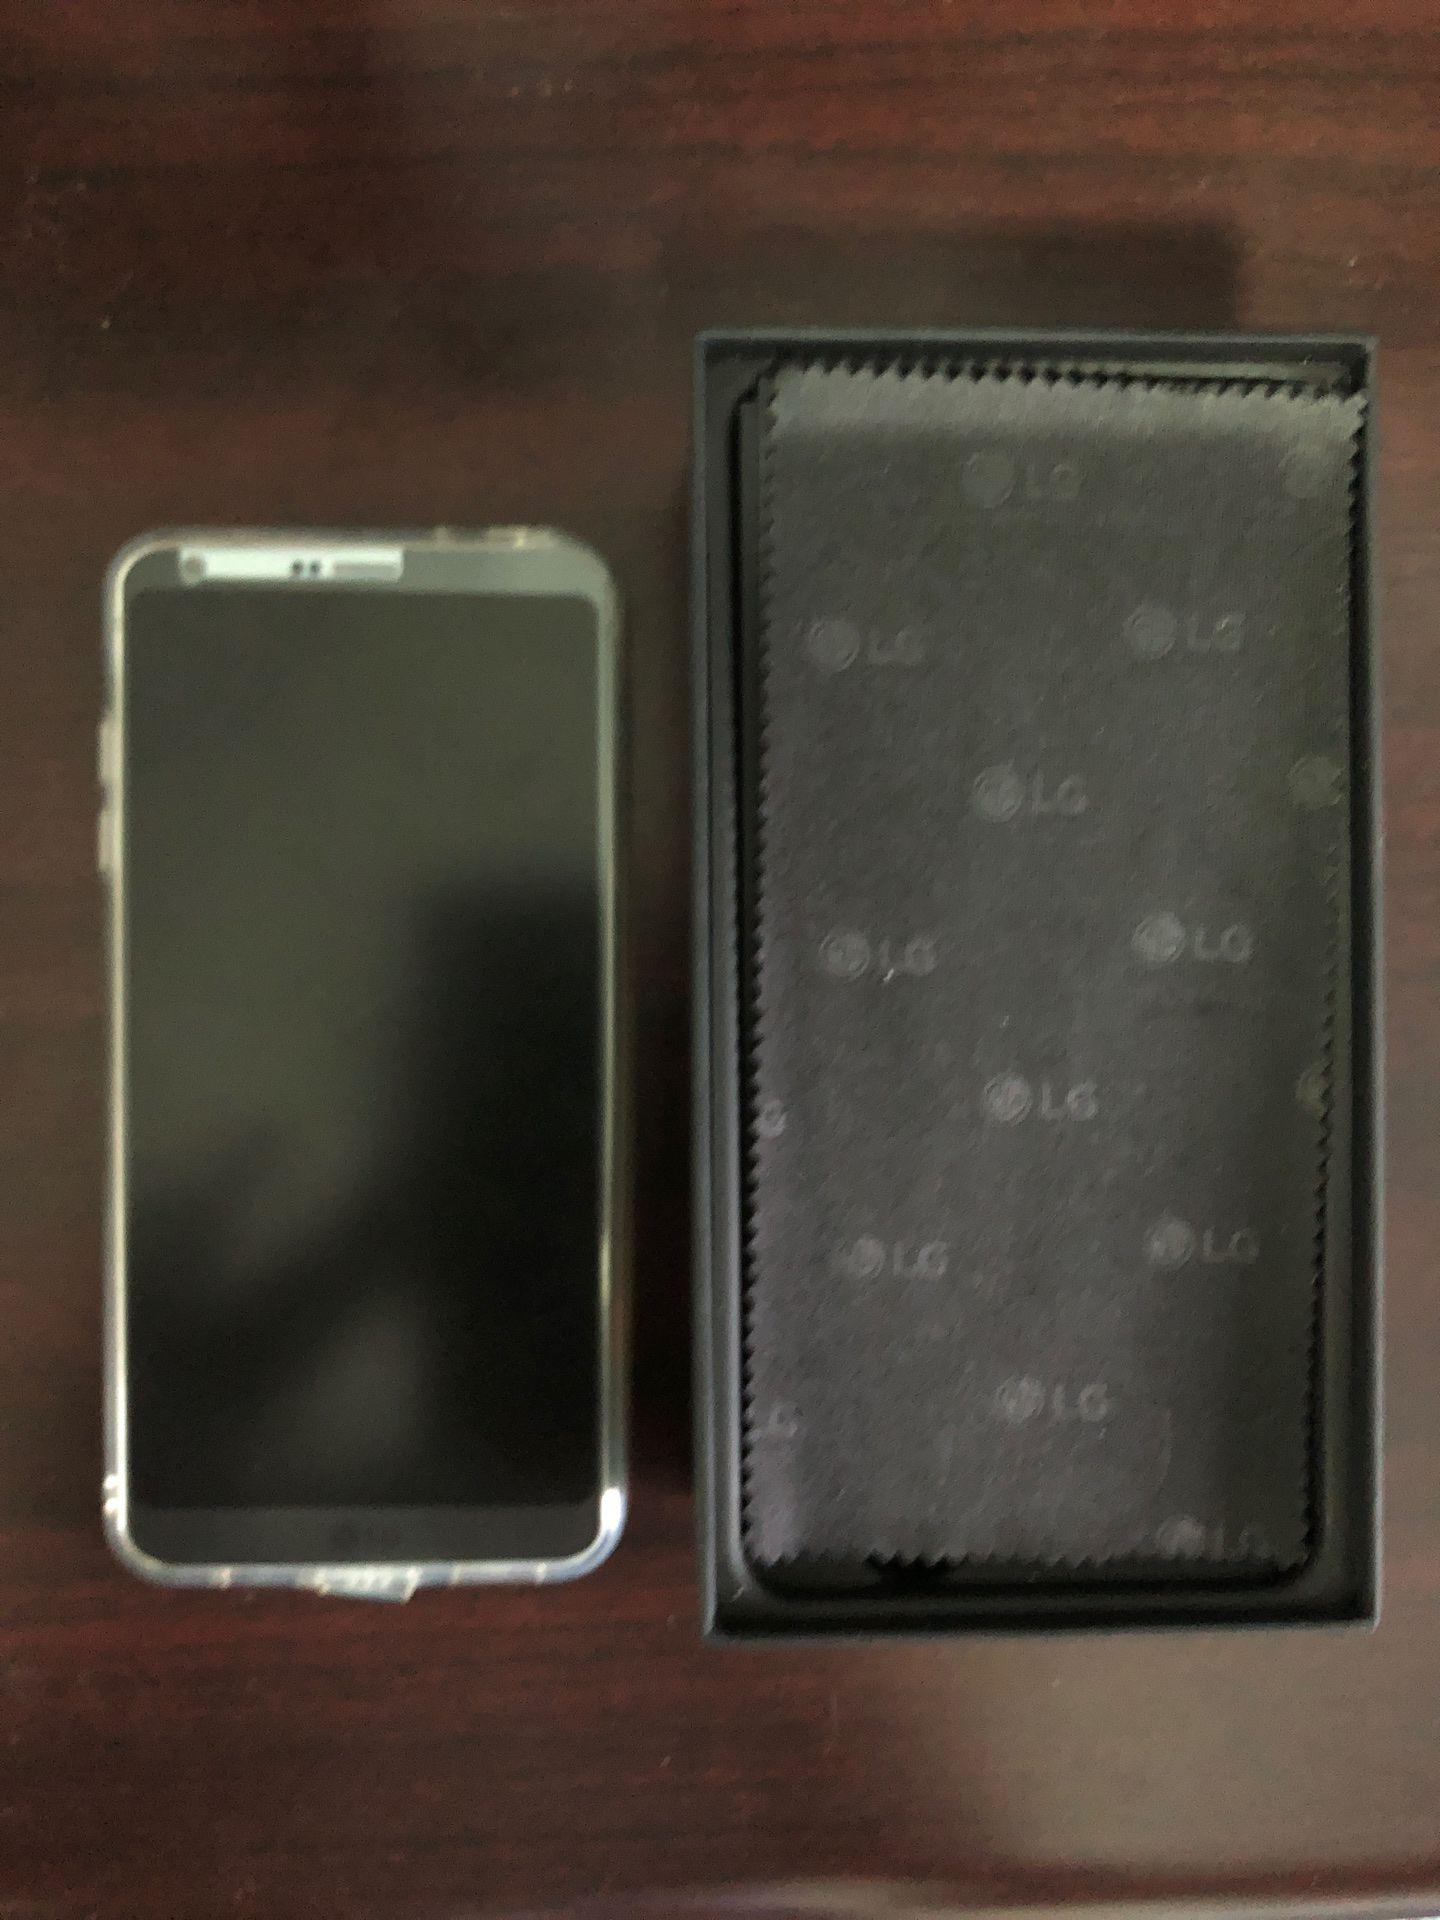 LG G6 Boost Mobile Locked